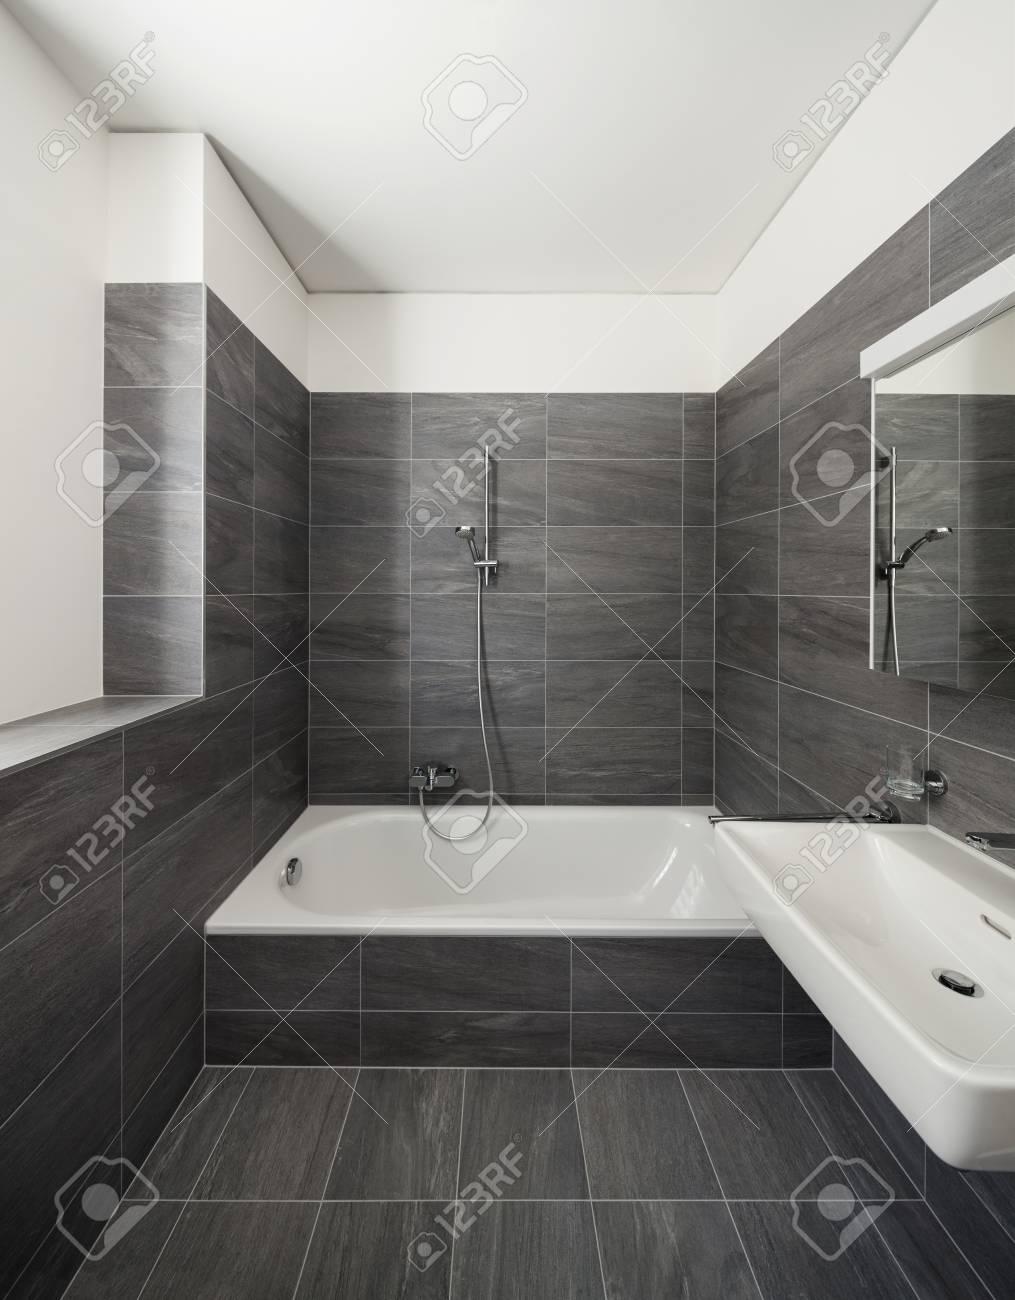 interieur maison moderne salle de bain burnsocial